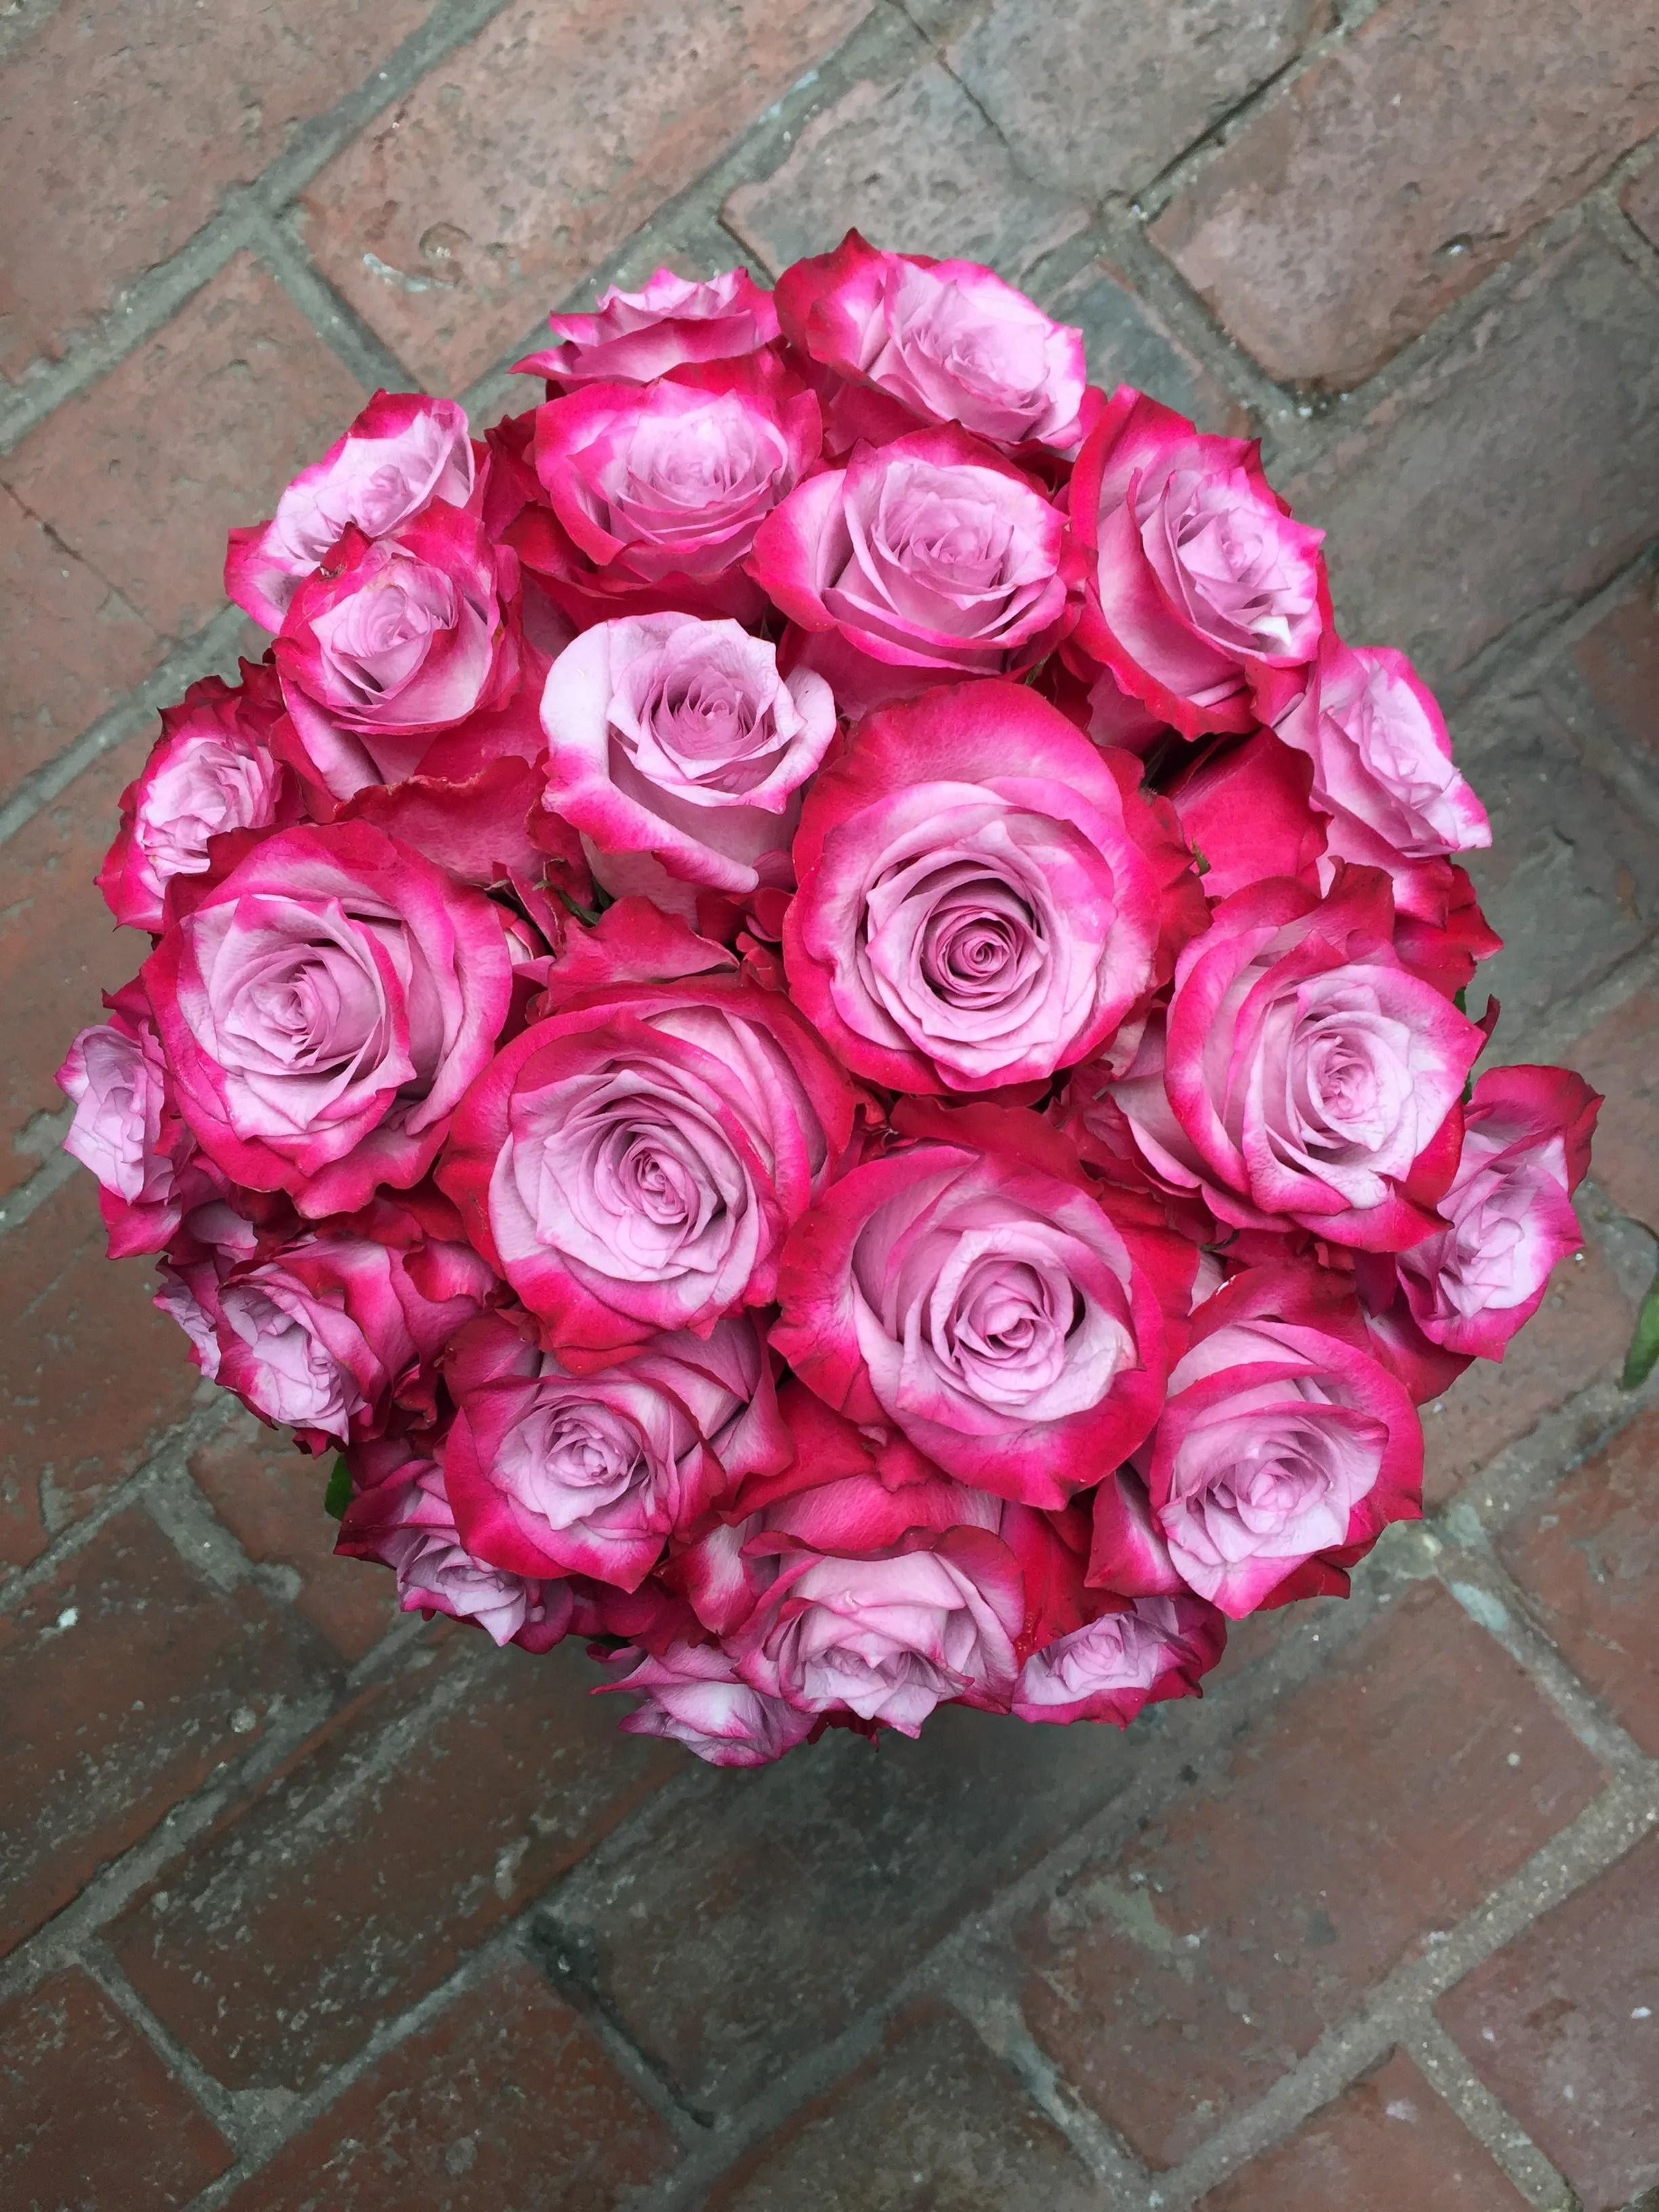 deep purple roses galore